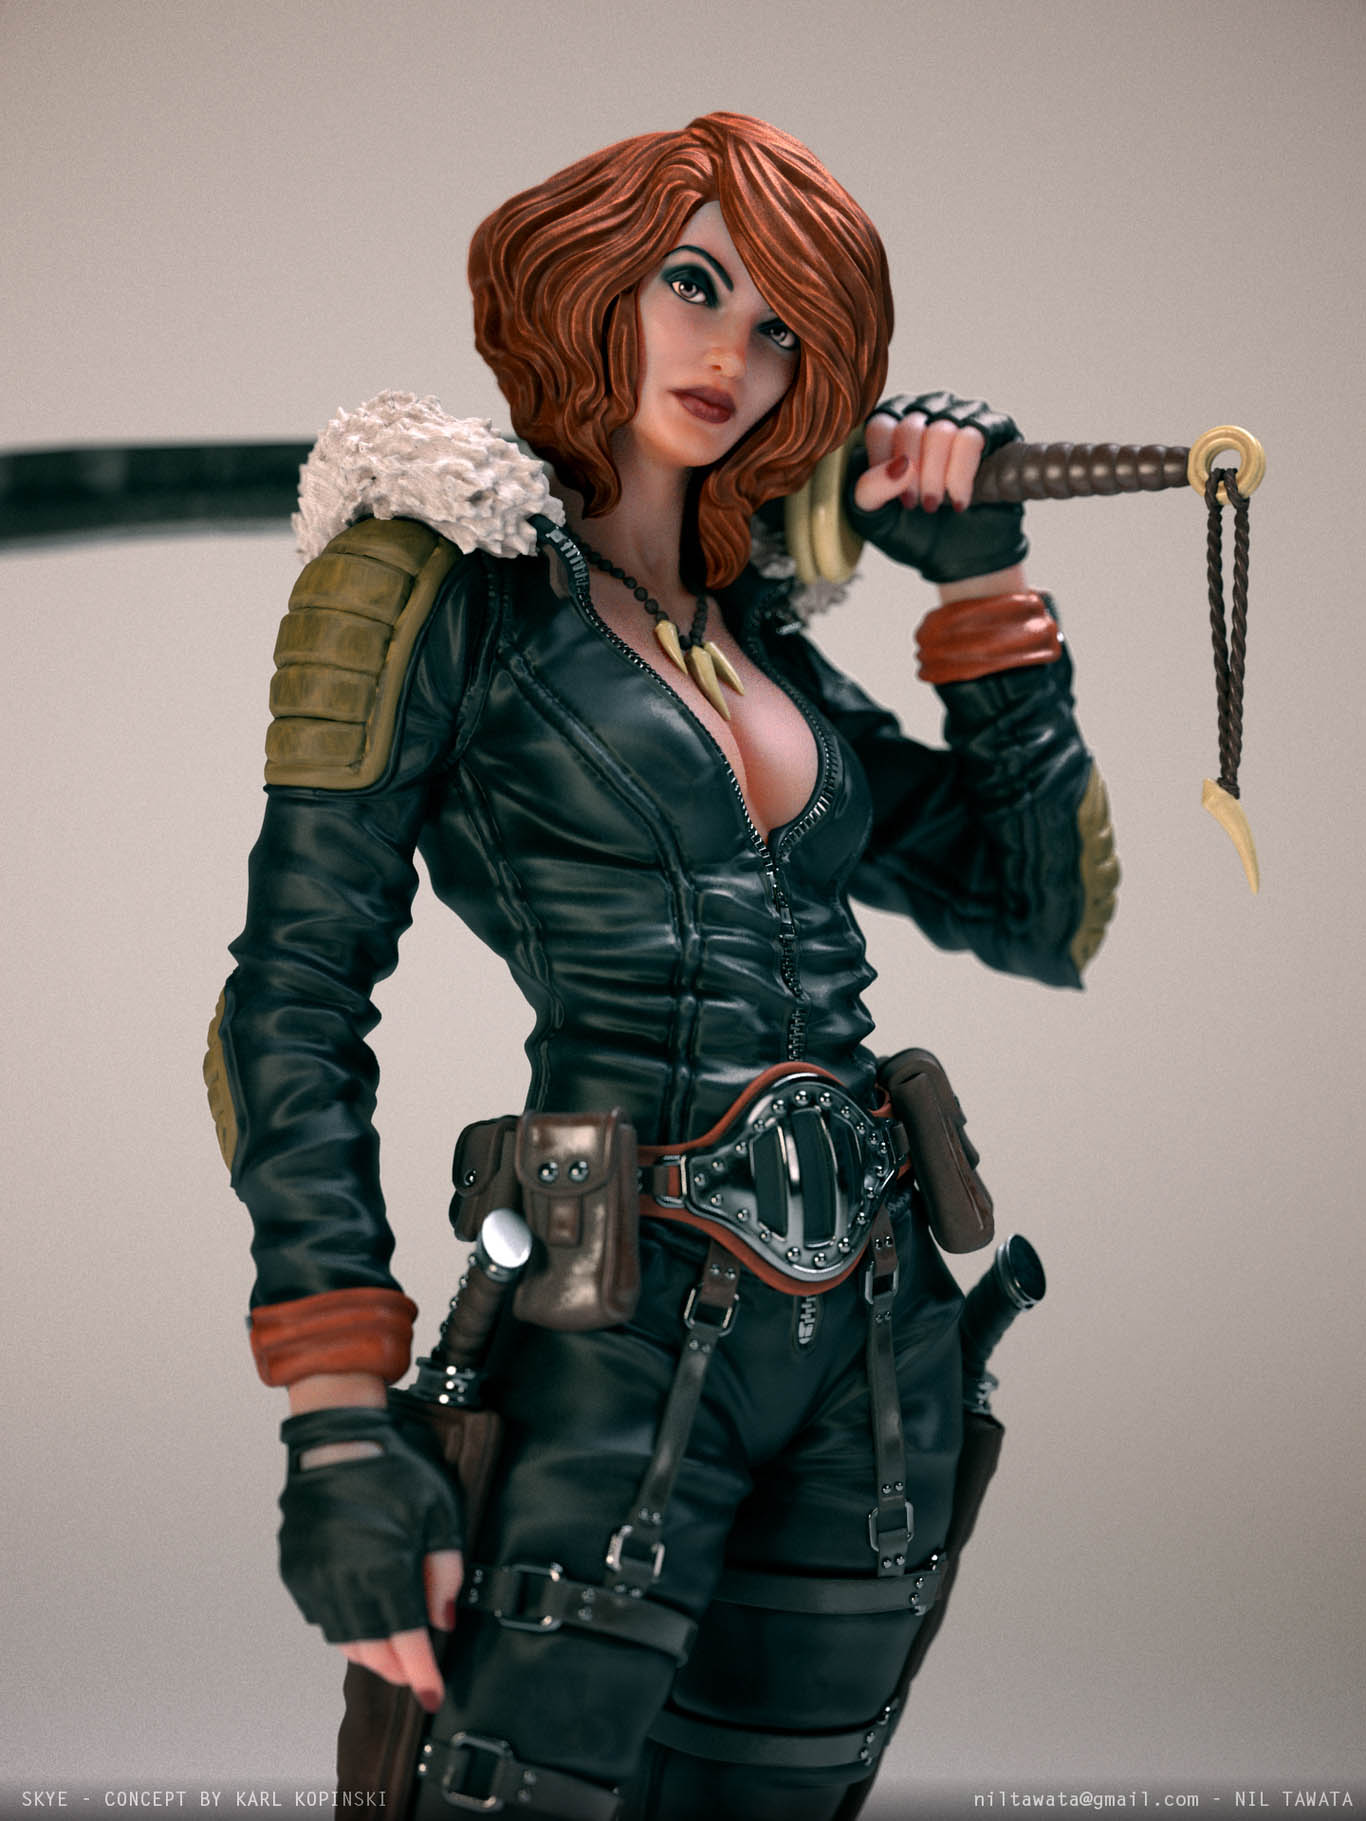 3d model character skye